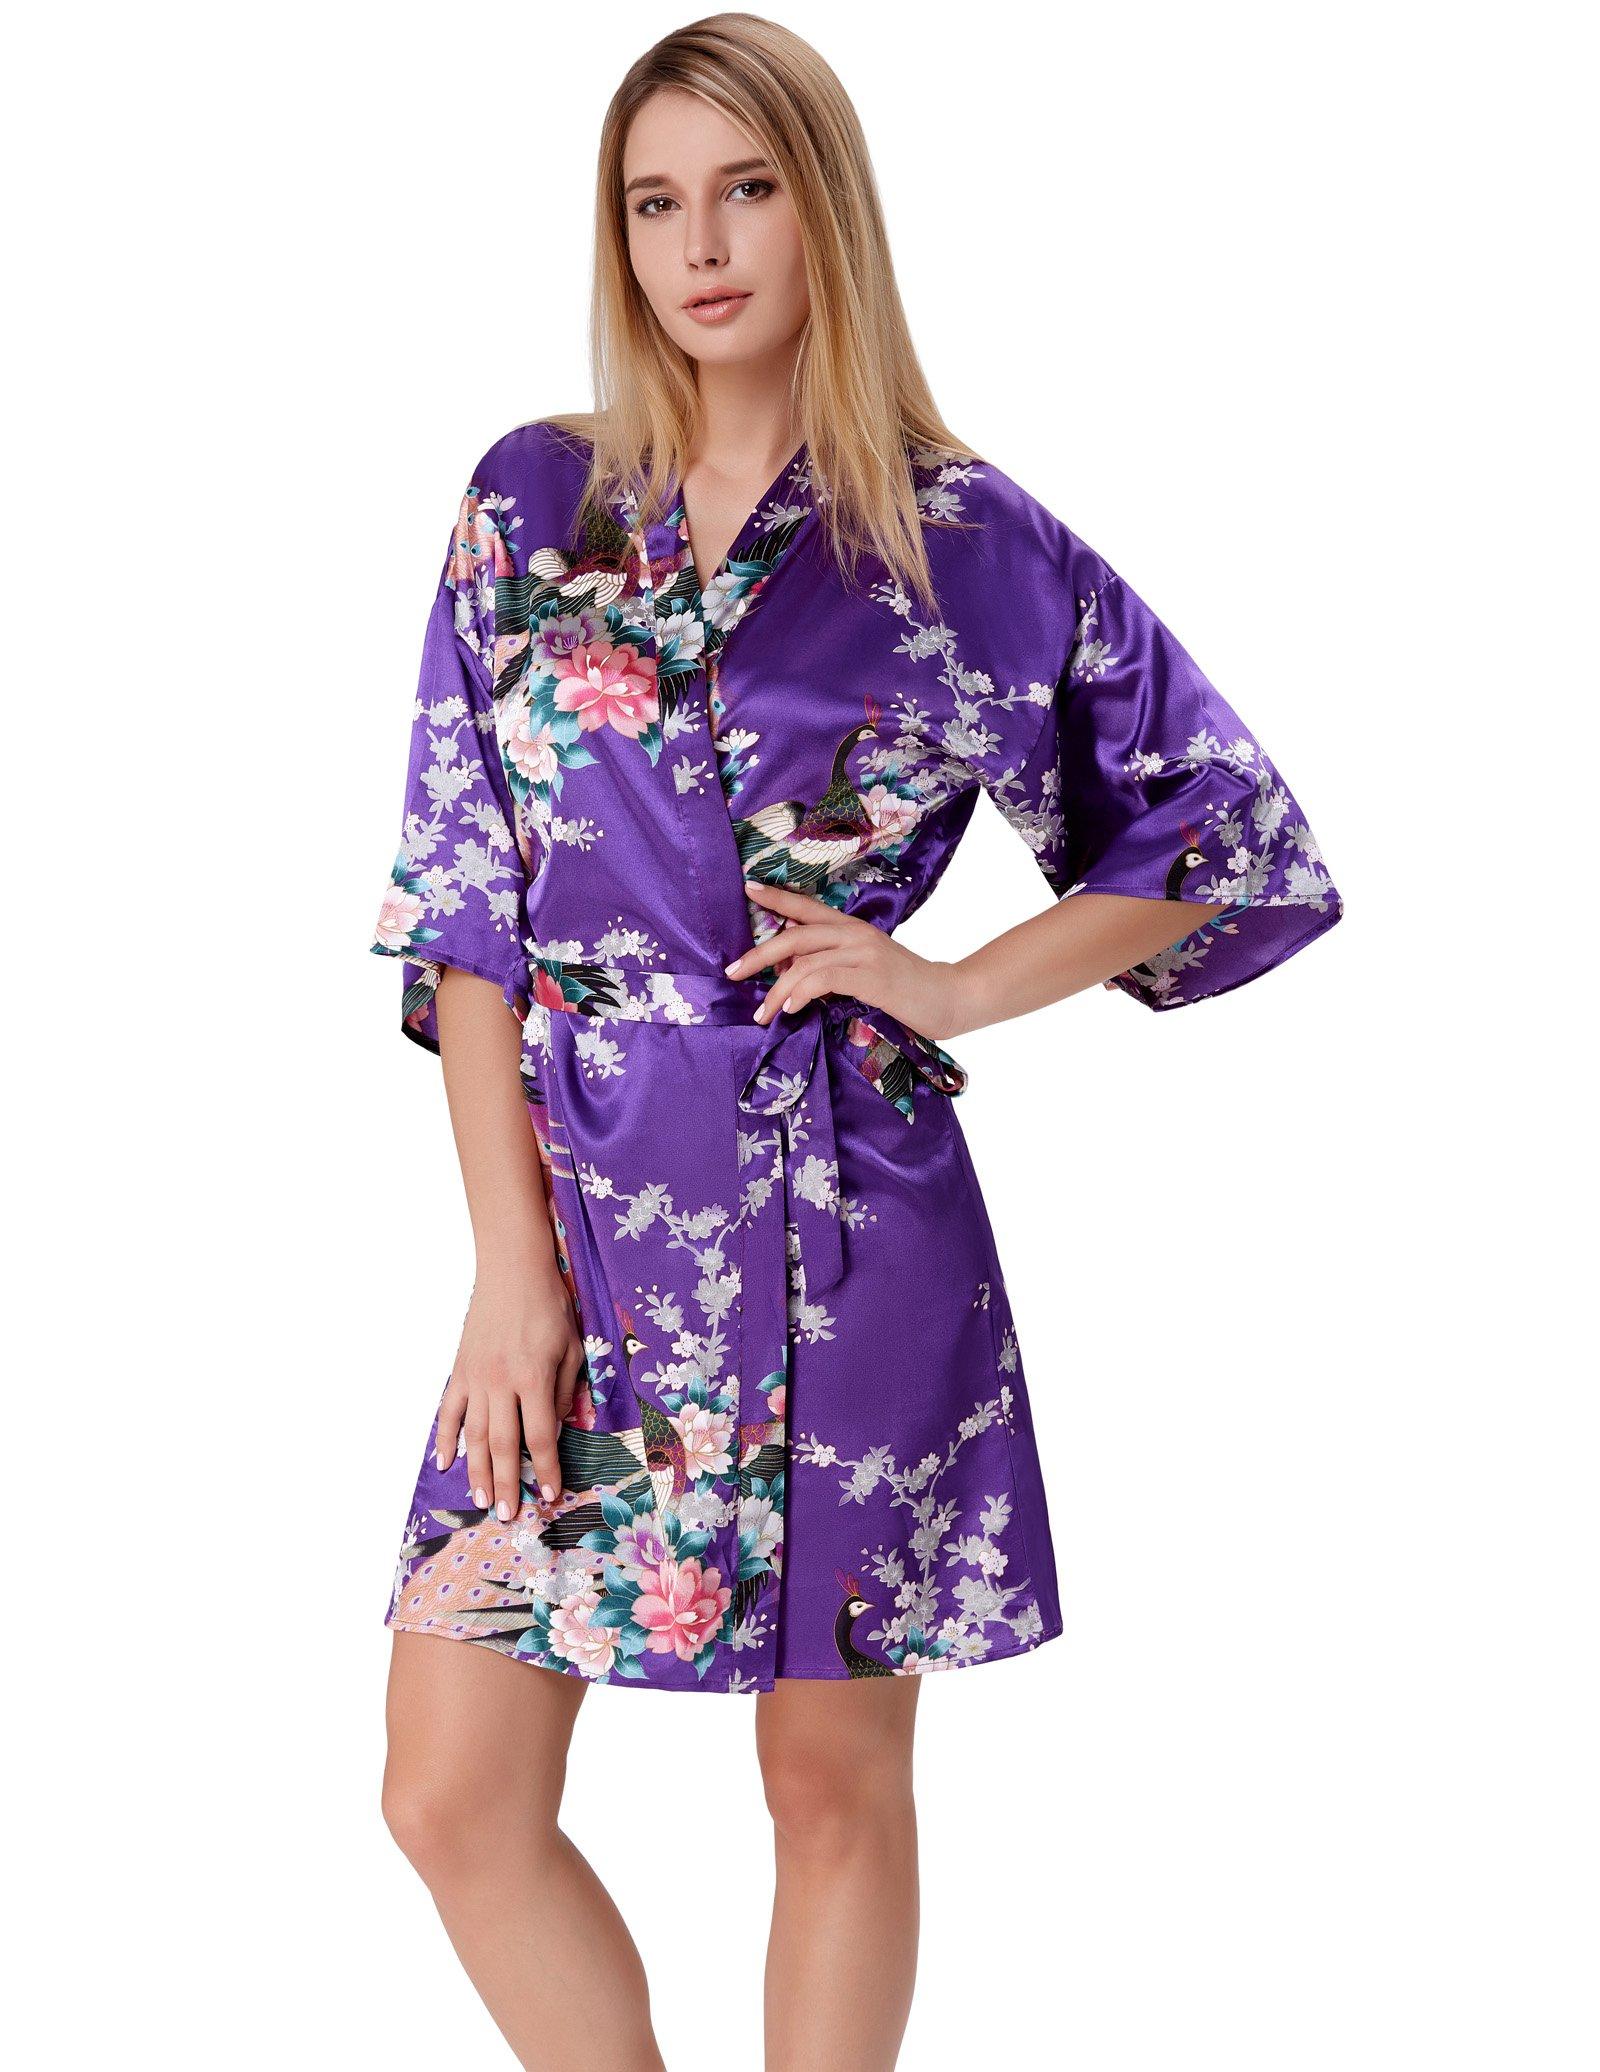 Plus Size Robes for Women Short Style Blossom Sleepwear Purple Size XXL ZE53-2